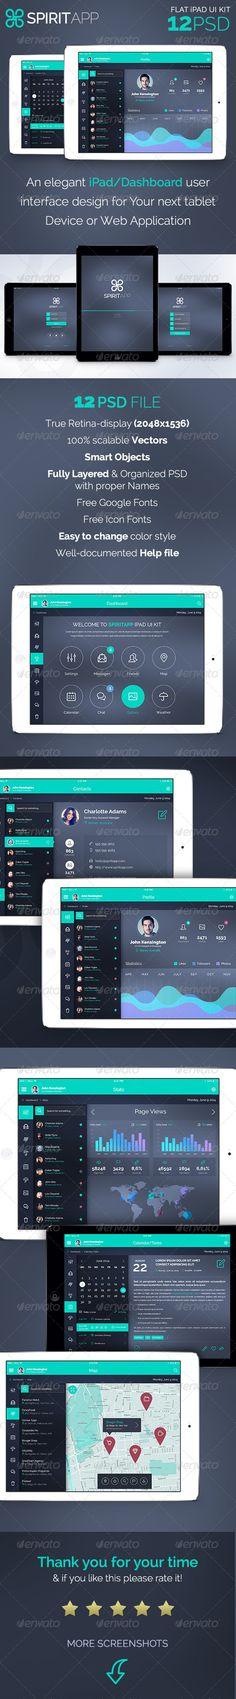 SpiritApp - Flat iPad App UI Kit Template PSD #design Download: http://graphicriver.net/item/spiritapp-flat-ipad-app-ui-kit/7979770?ref=ksioks